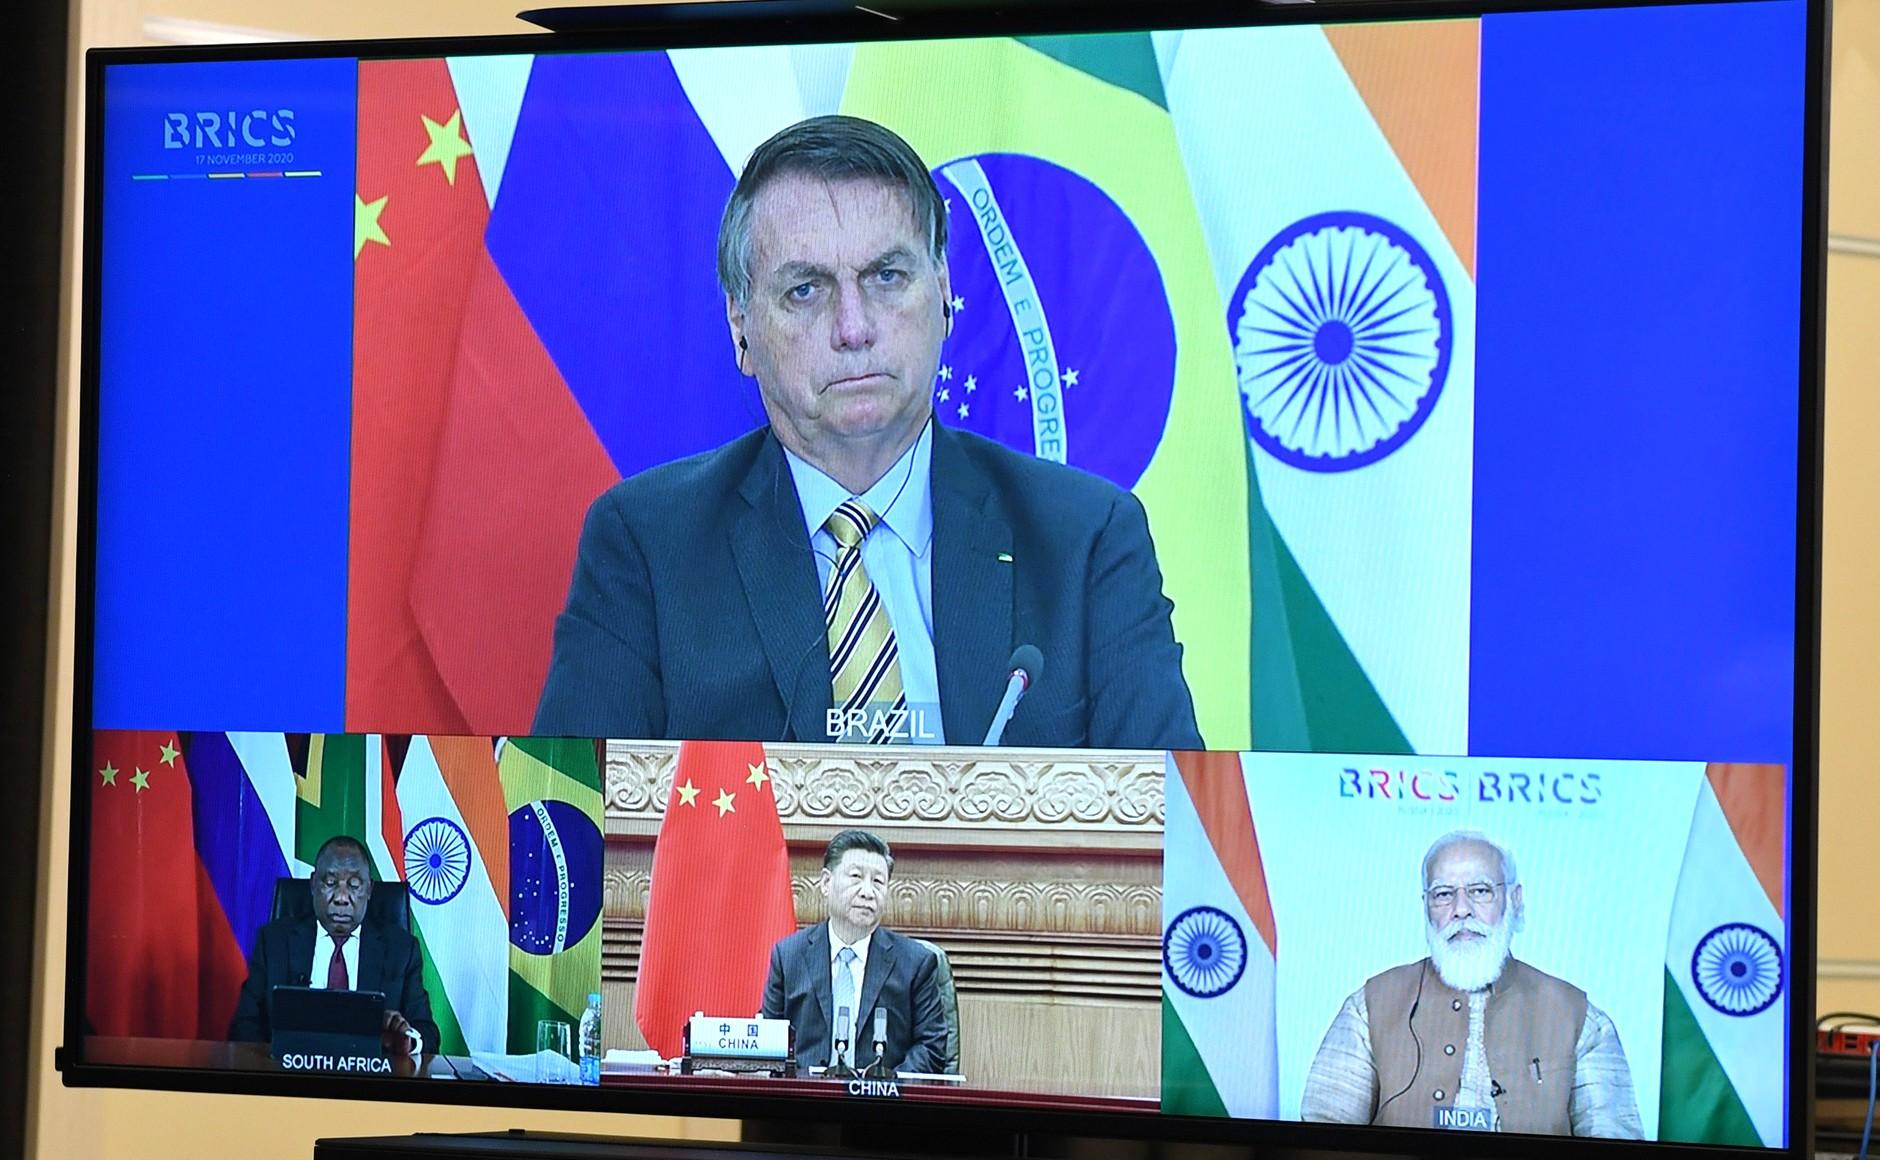 BRICS KREMLIN PH 3 XX 4 BRICS 17.11.2020 Sommet BRICS